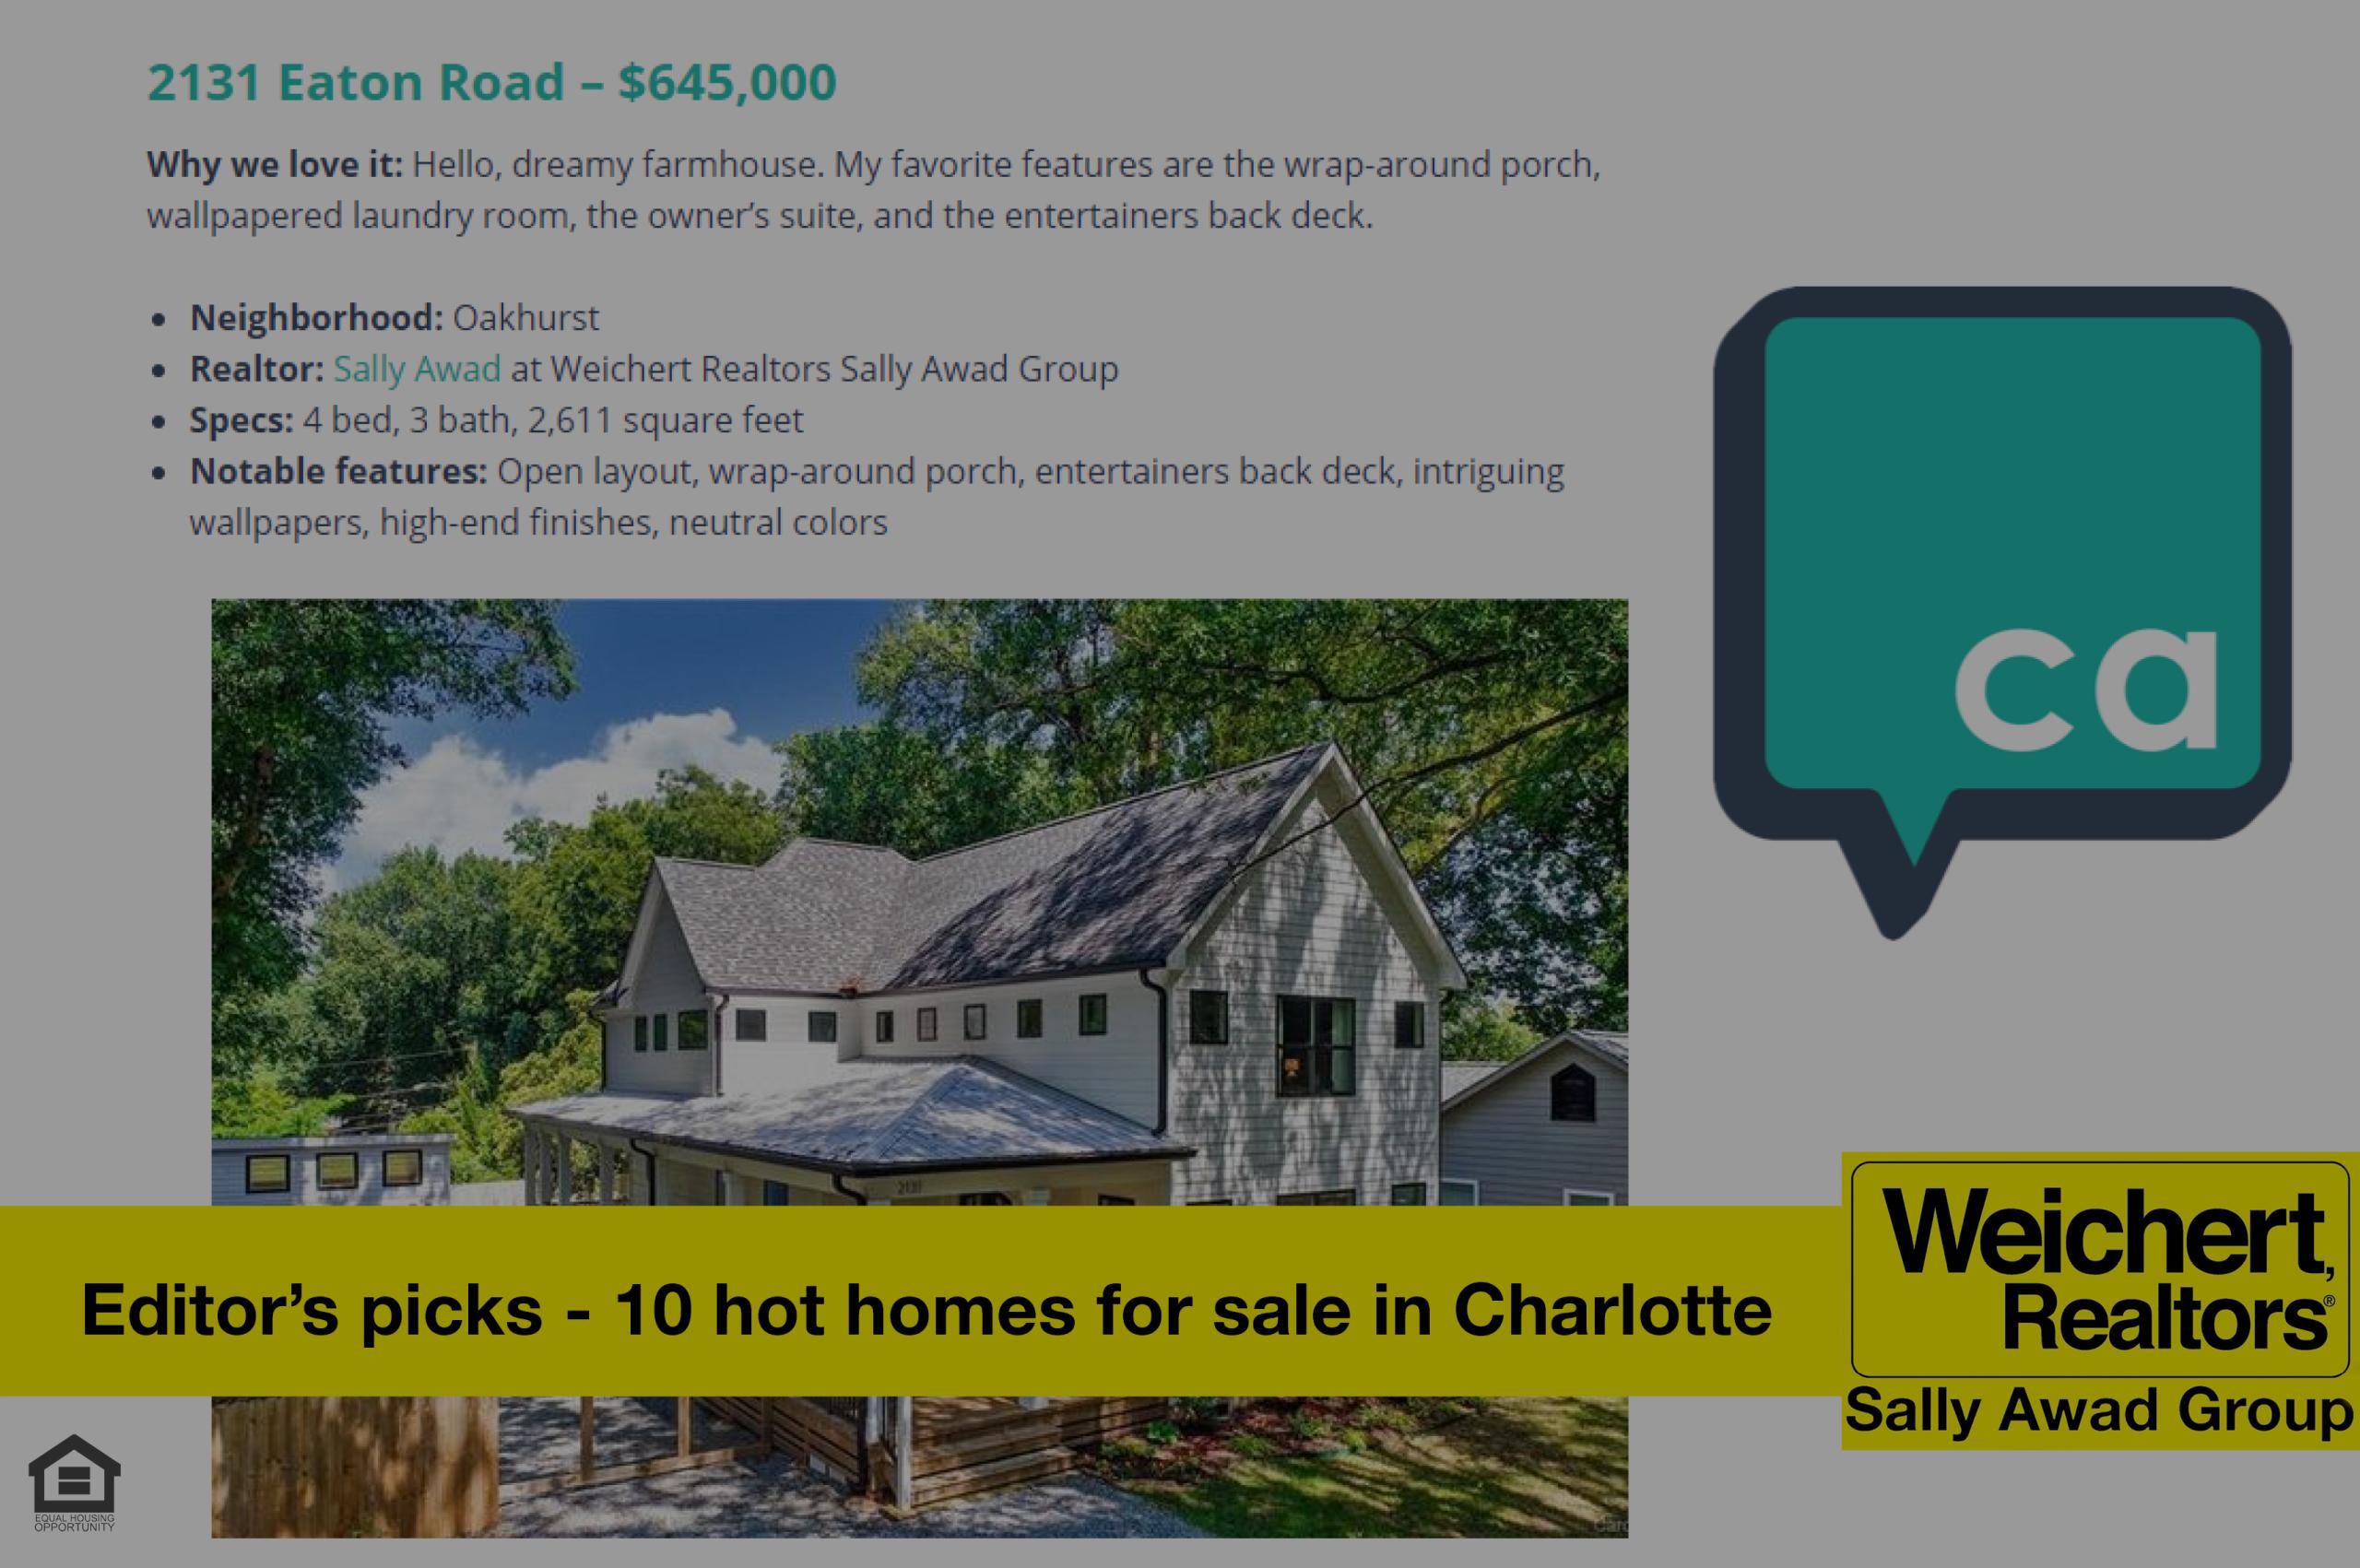 Listing Named on Charlotte Agenda's Editor's picks: 10 hot homes for sale in Charlotte right now